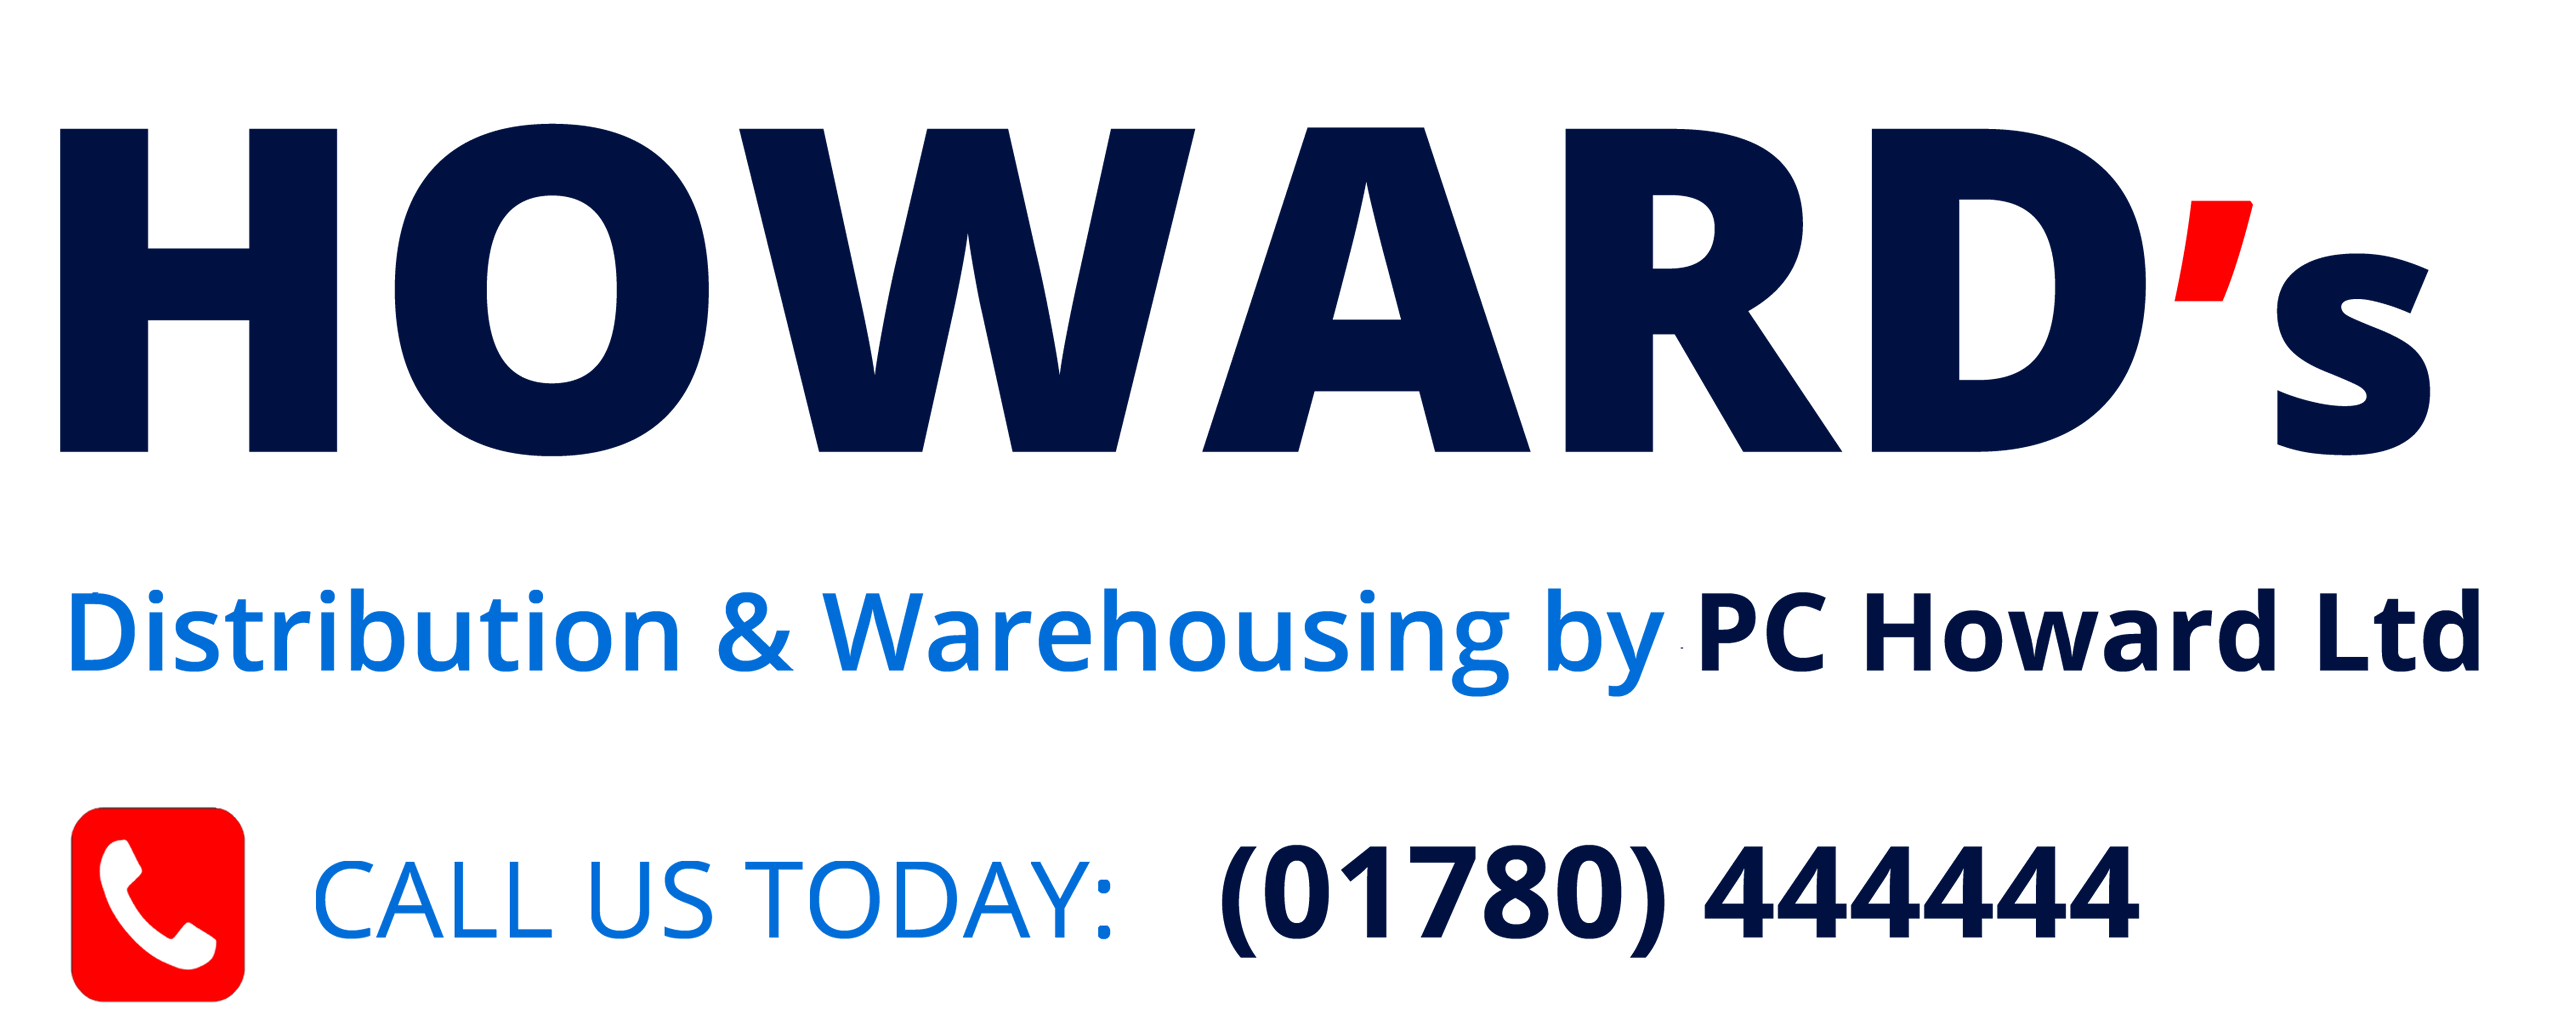 PC Howard Ltd - Home